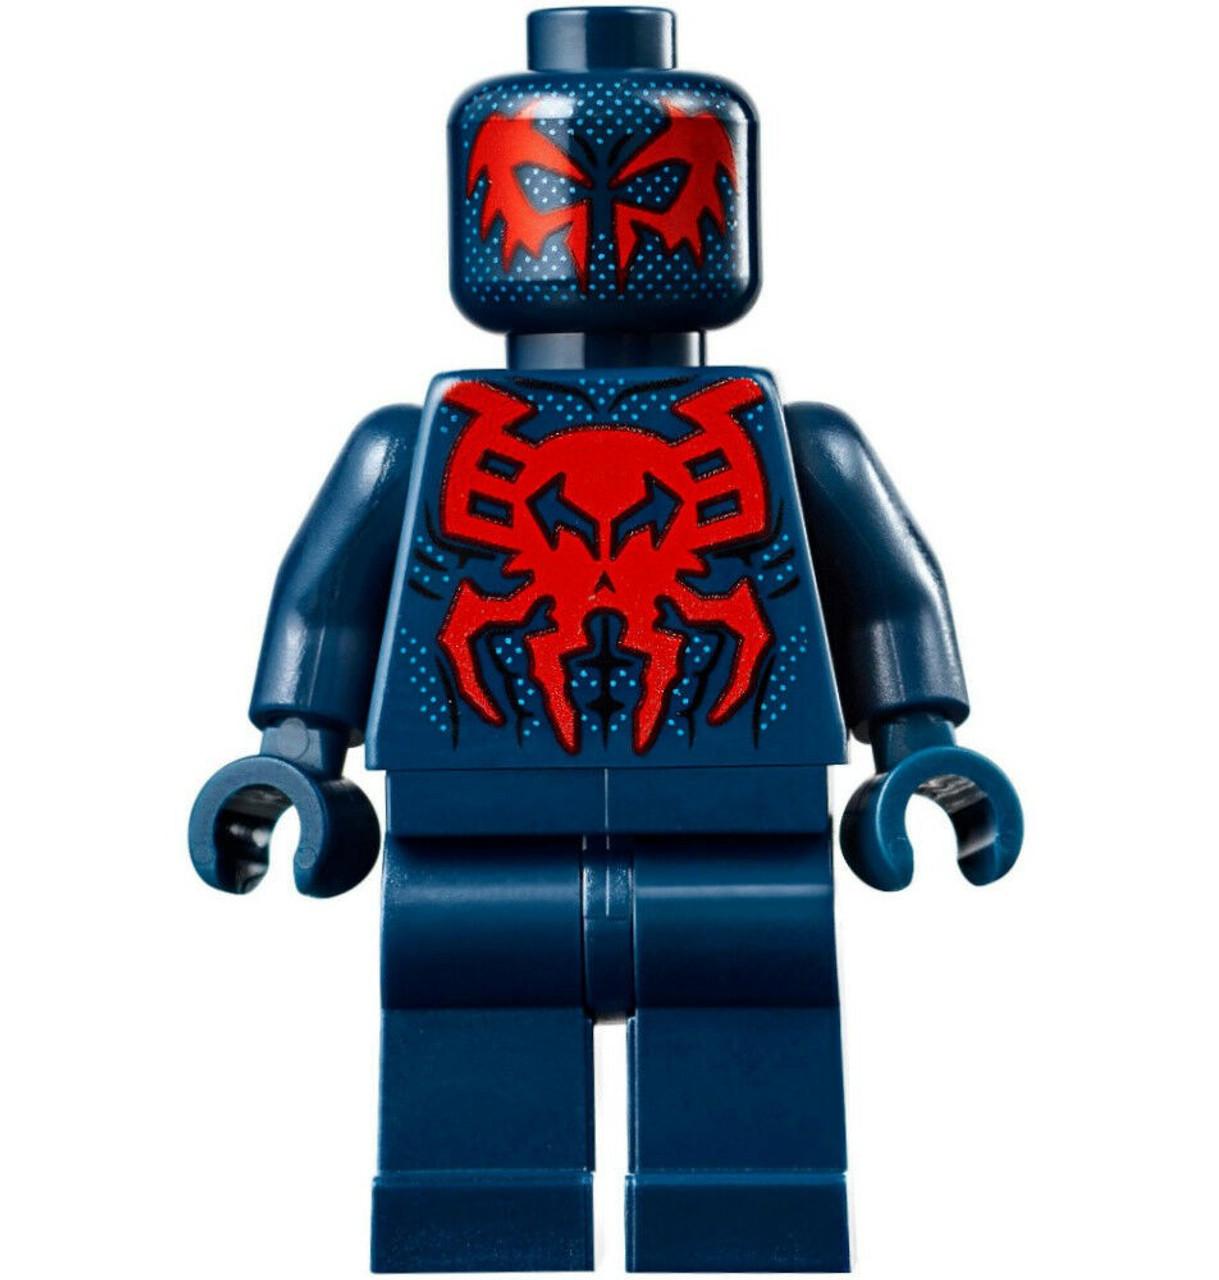 LEGO Marvel Super Heroes Spider-Man 2099 Minifigure Loose ...